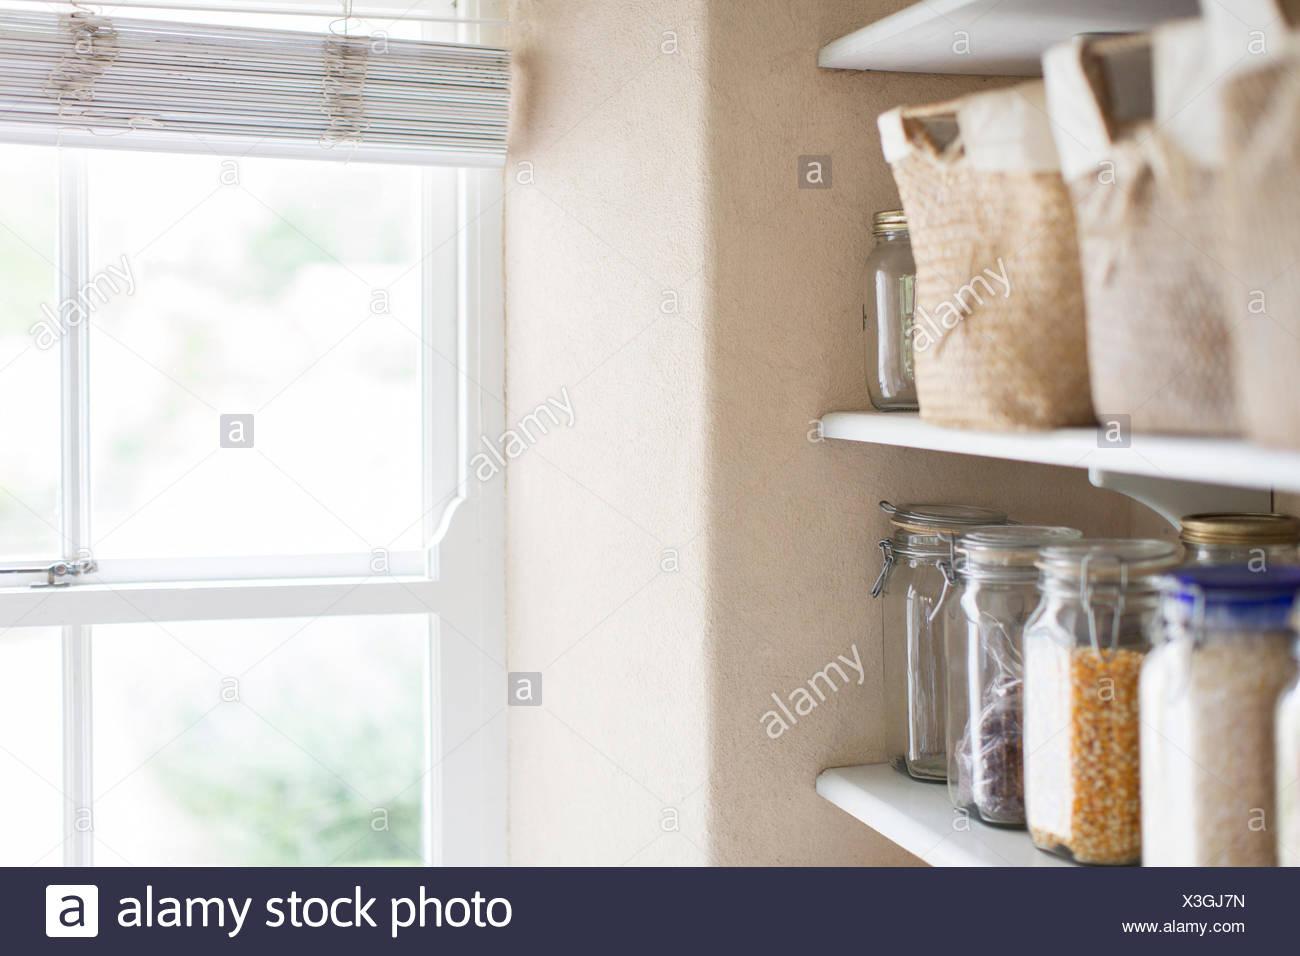 Kurzwaren und Fenster der Speisekammer Stockbild